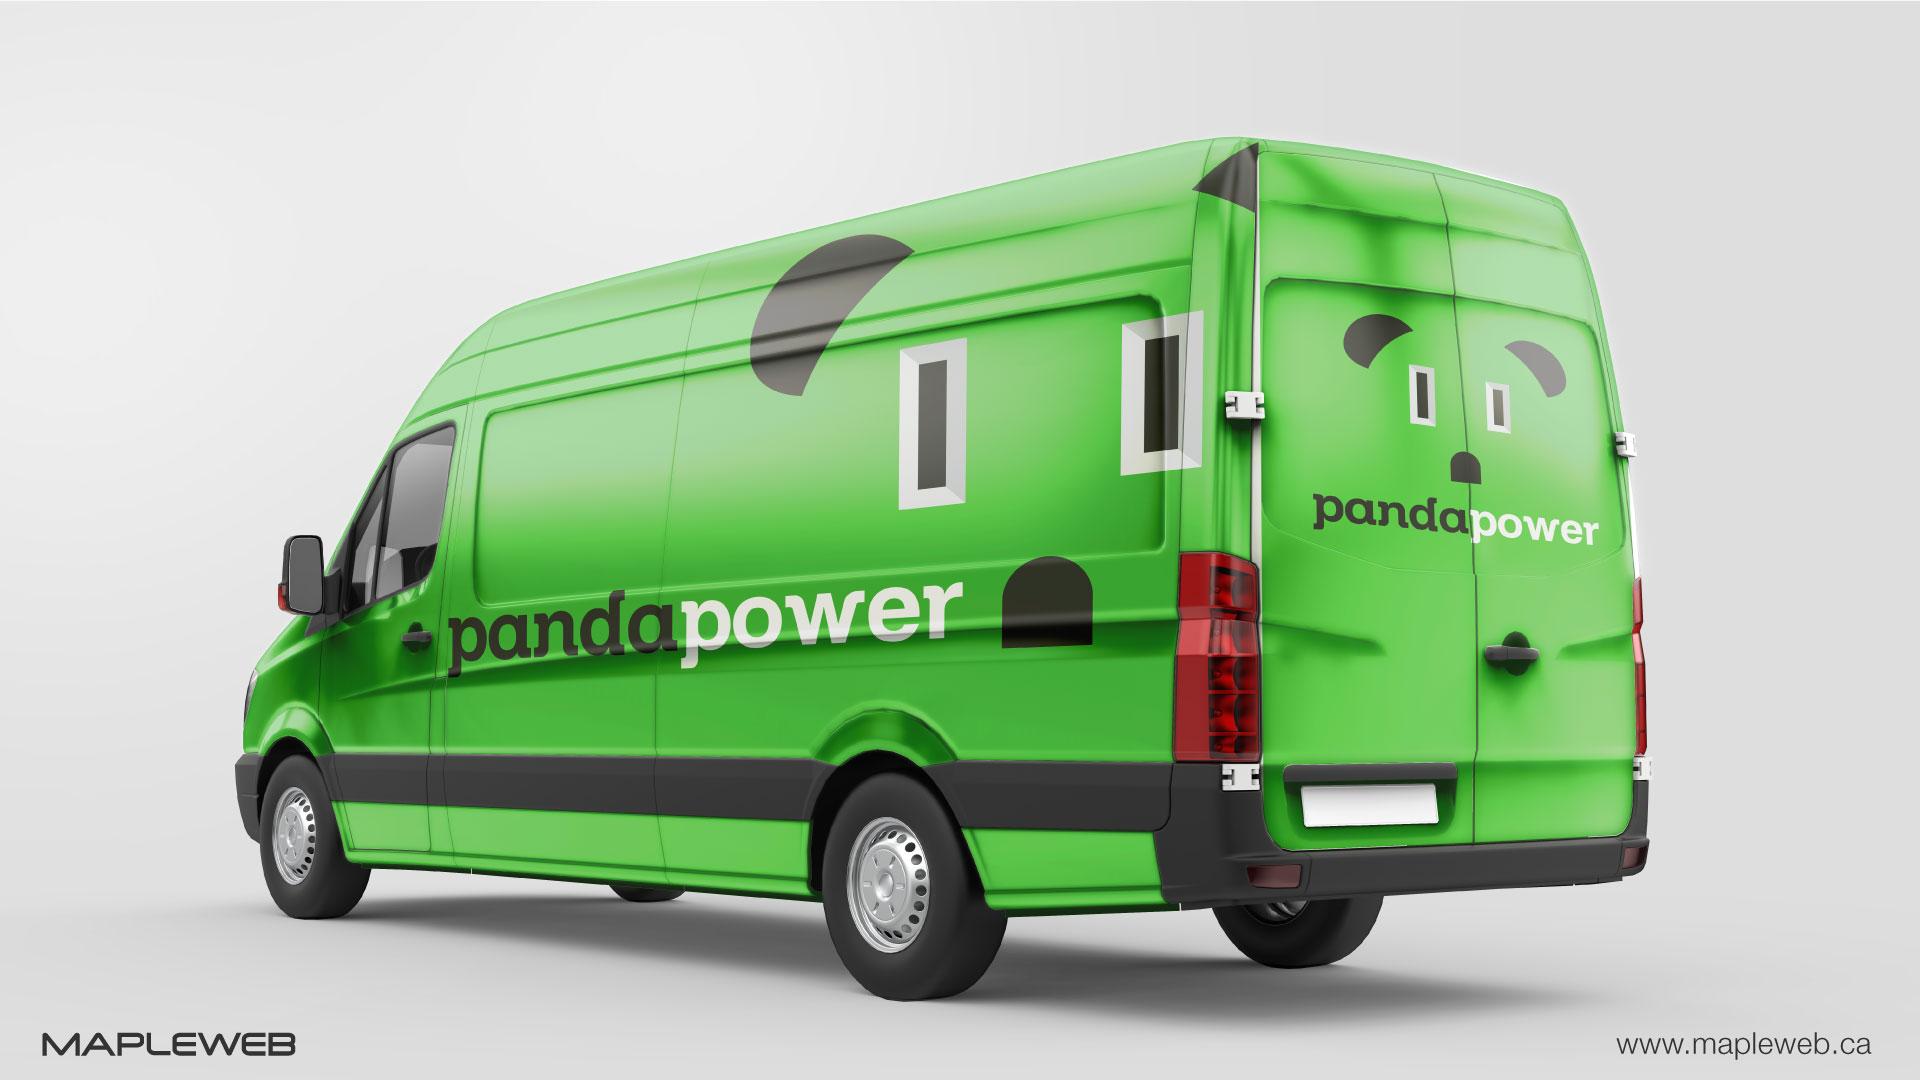 panda-power-design-by-mapleweb-vancouver-canada-toyota-mock